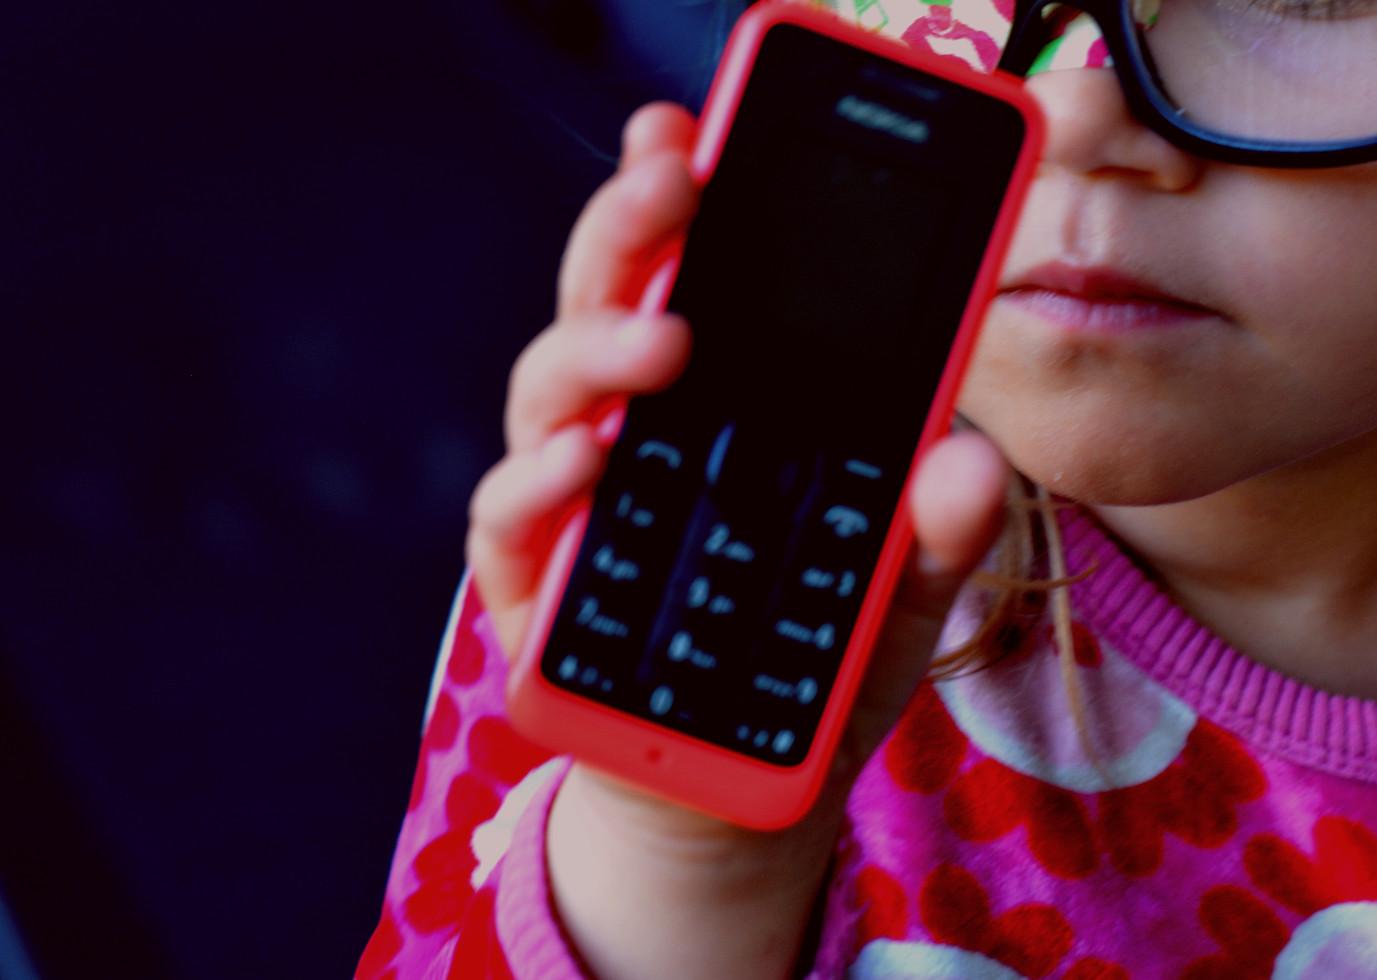 Orange knapptelefon